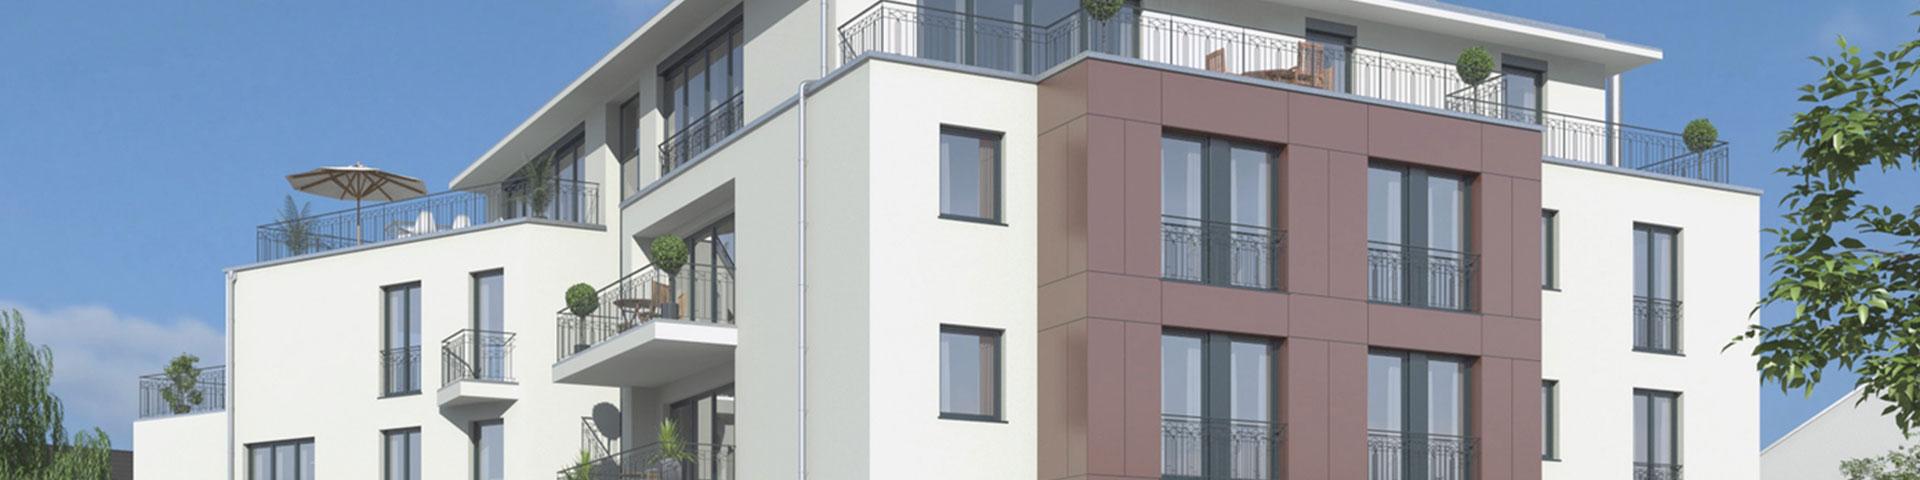 mfh neroblick wiesbaden d rfer grohnmeier architektur partnerschaft mbb. Black Bedroom Furniture Sets. Home Design Ideas